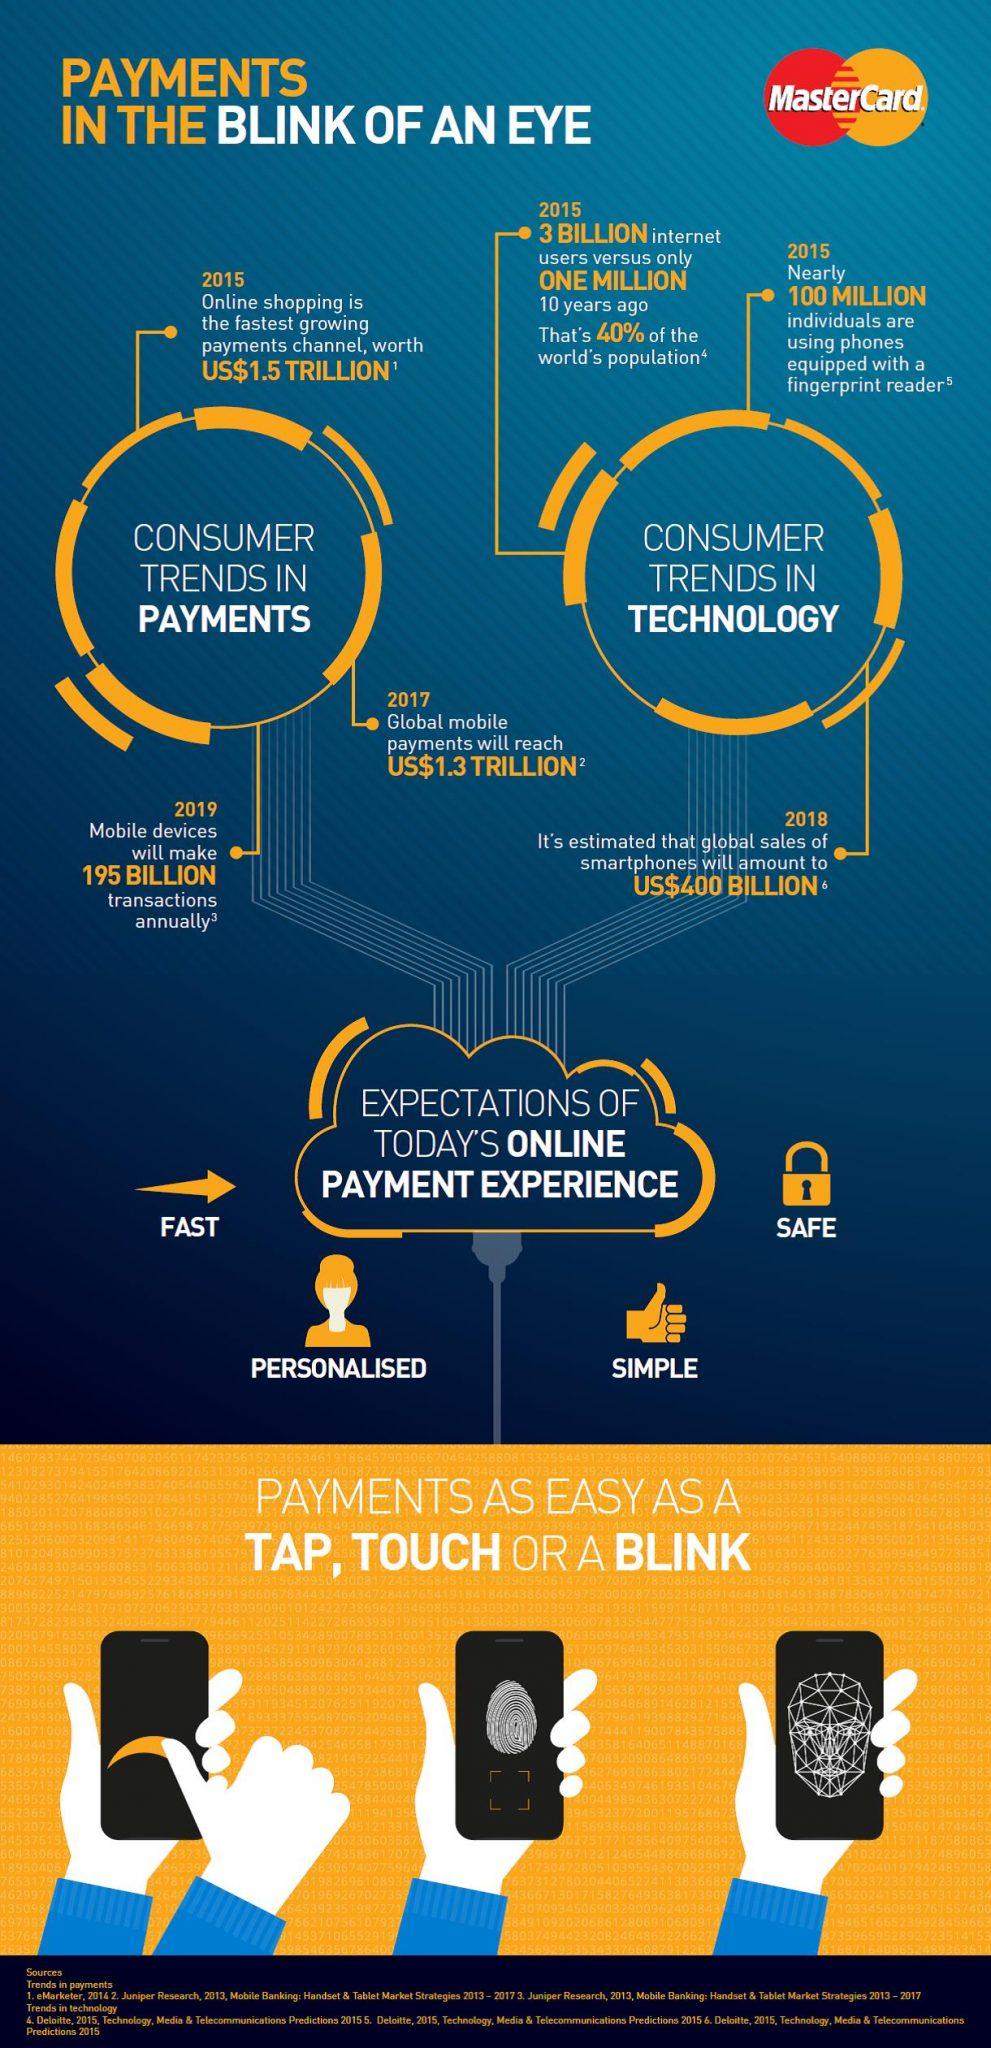 Mastercard-biometric-infographic-02-16